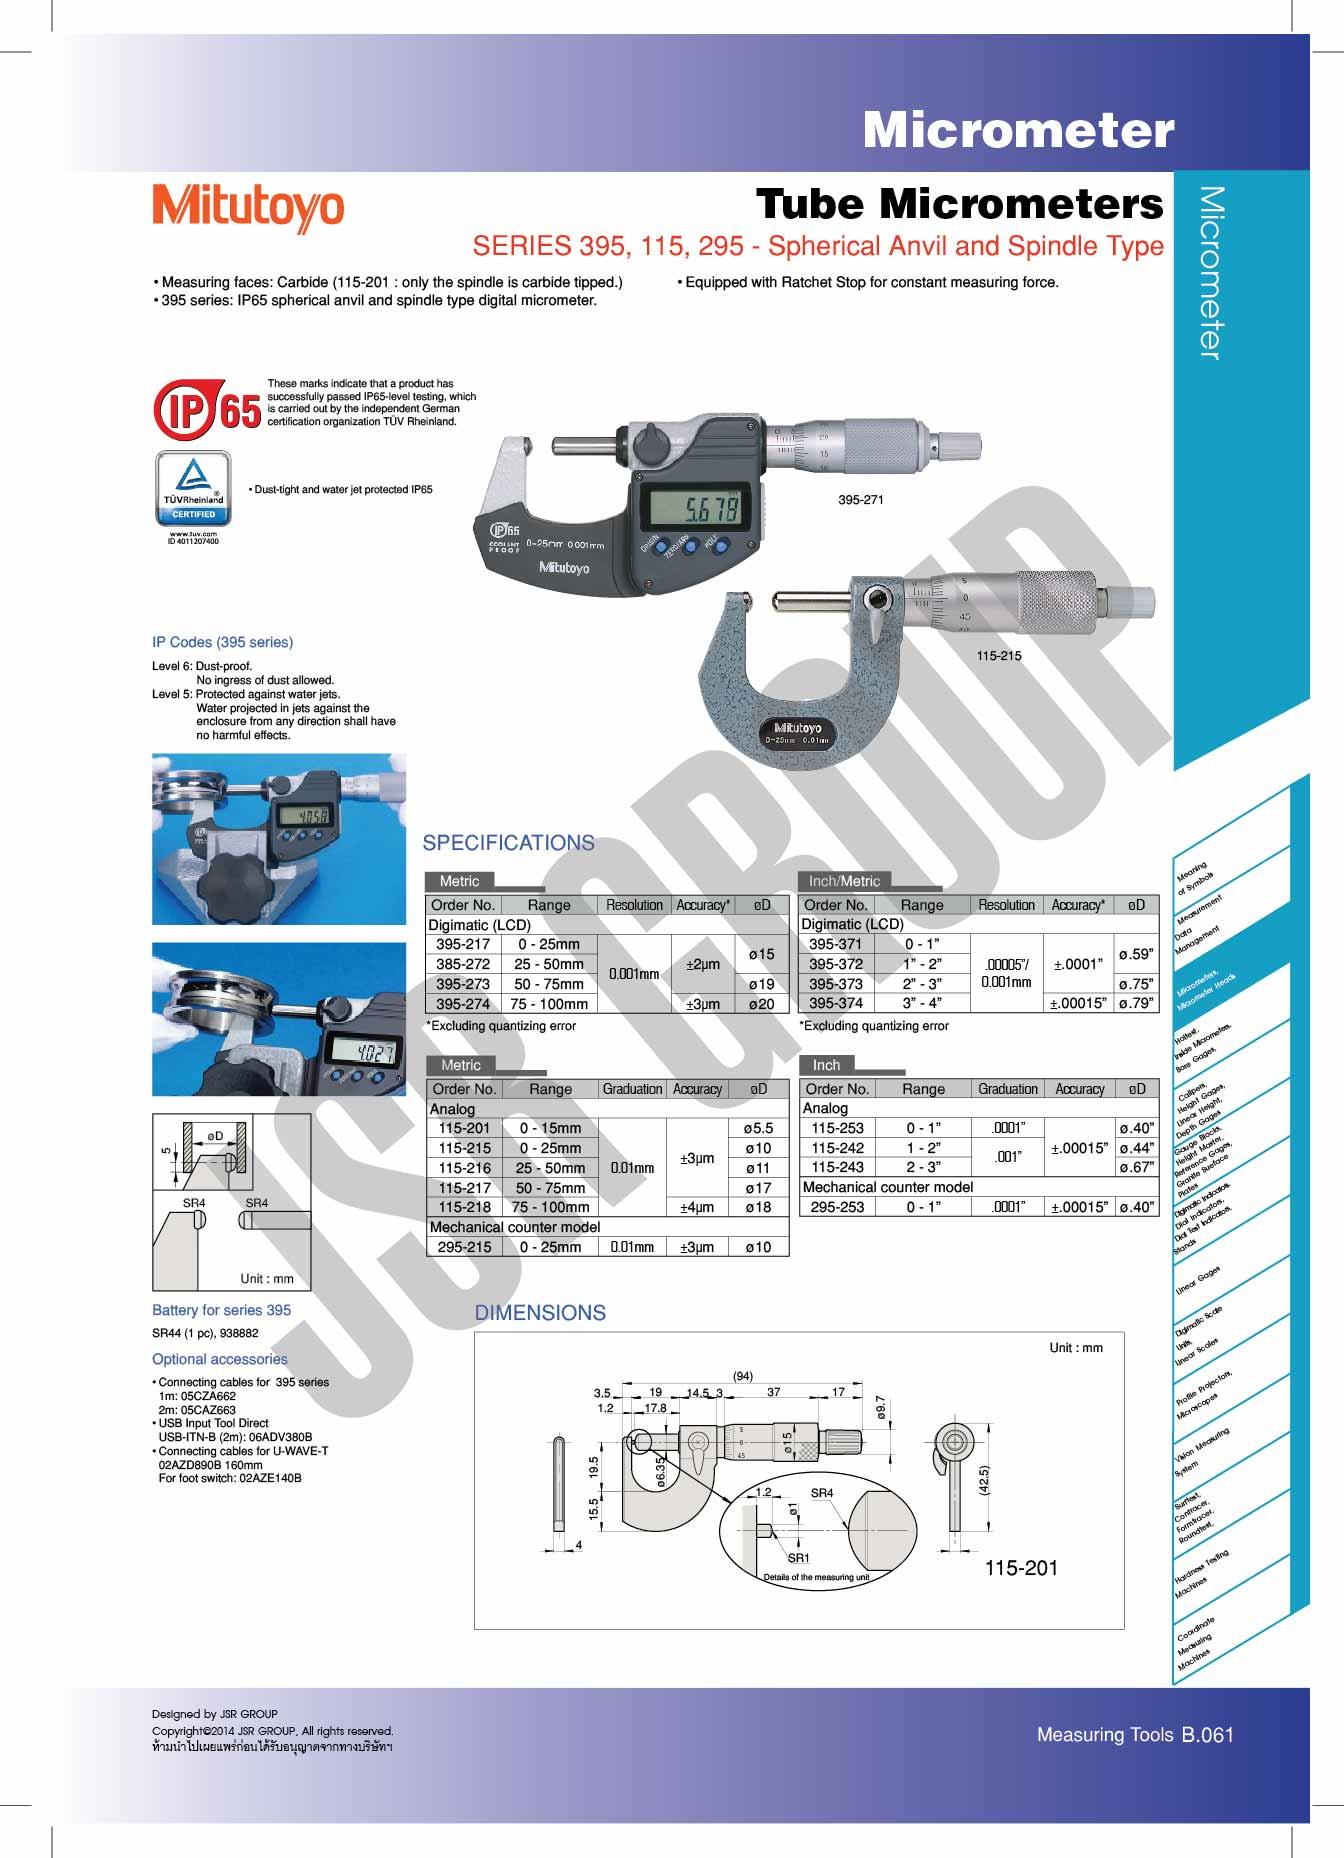 Tube Micrometers SERIES 395,115,295 Spherical Anvil and Spindle Type Mitutoyo table